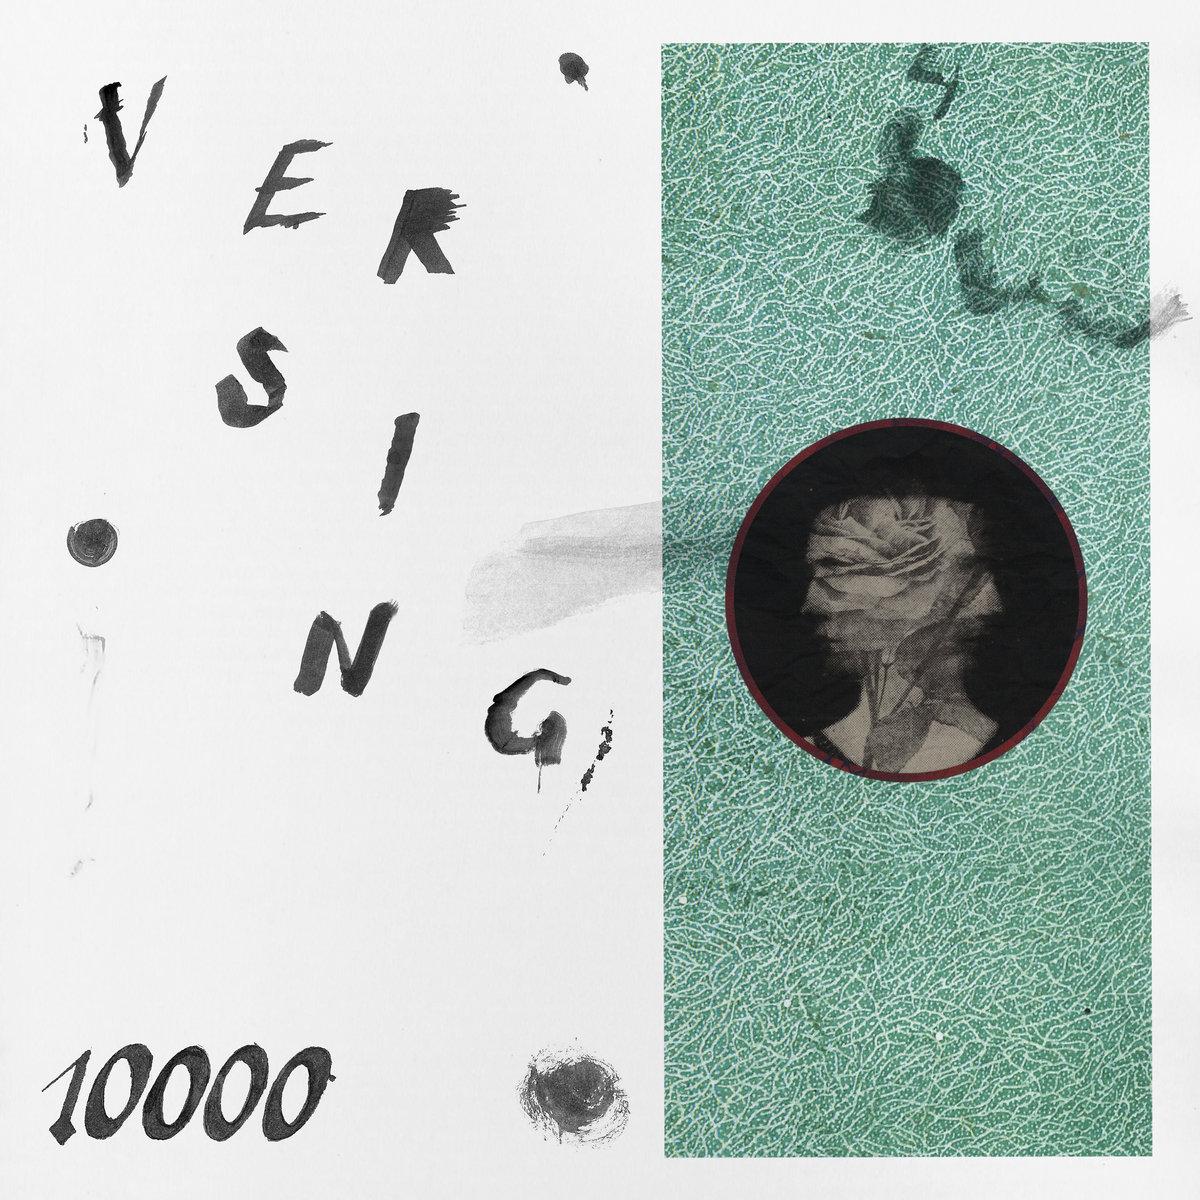 Versing - 1000